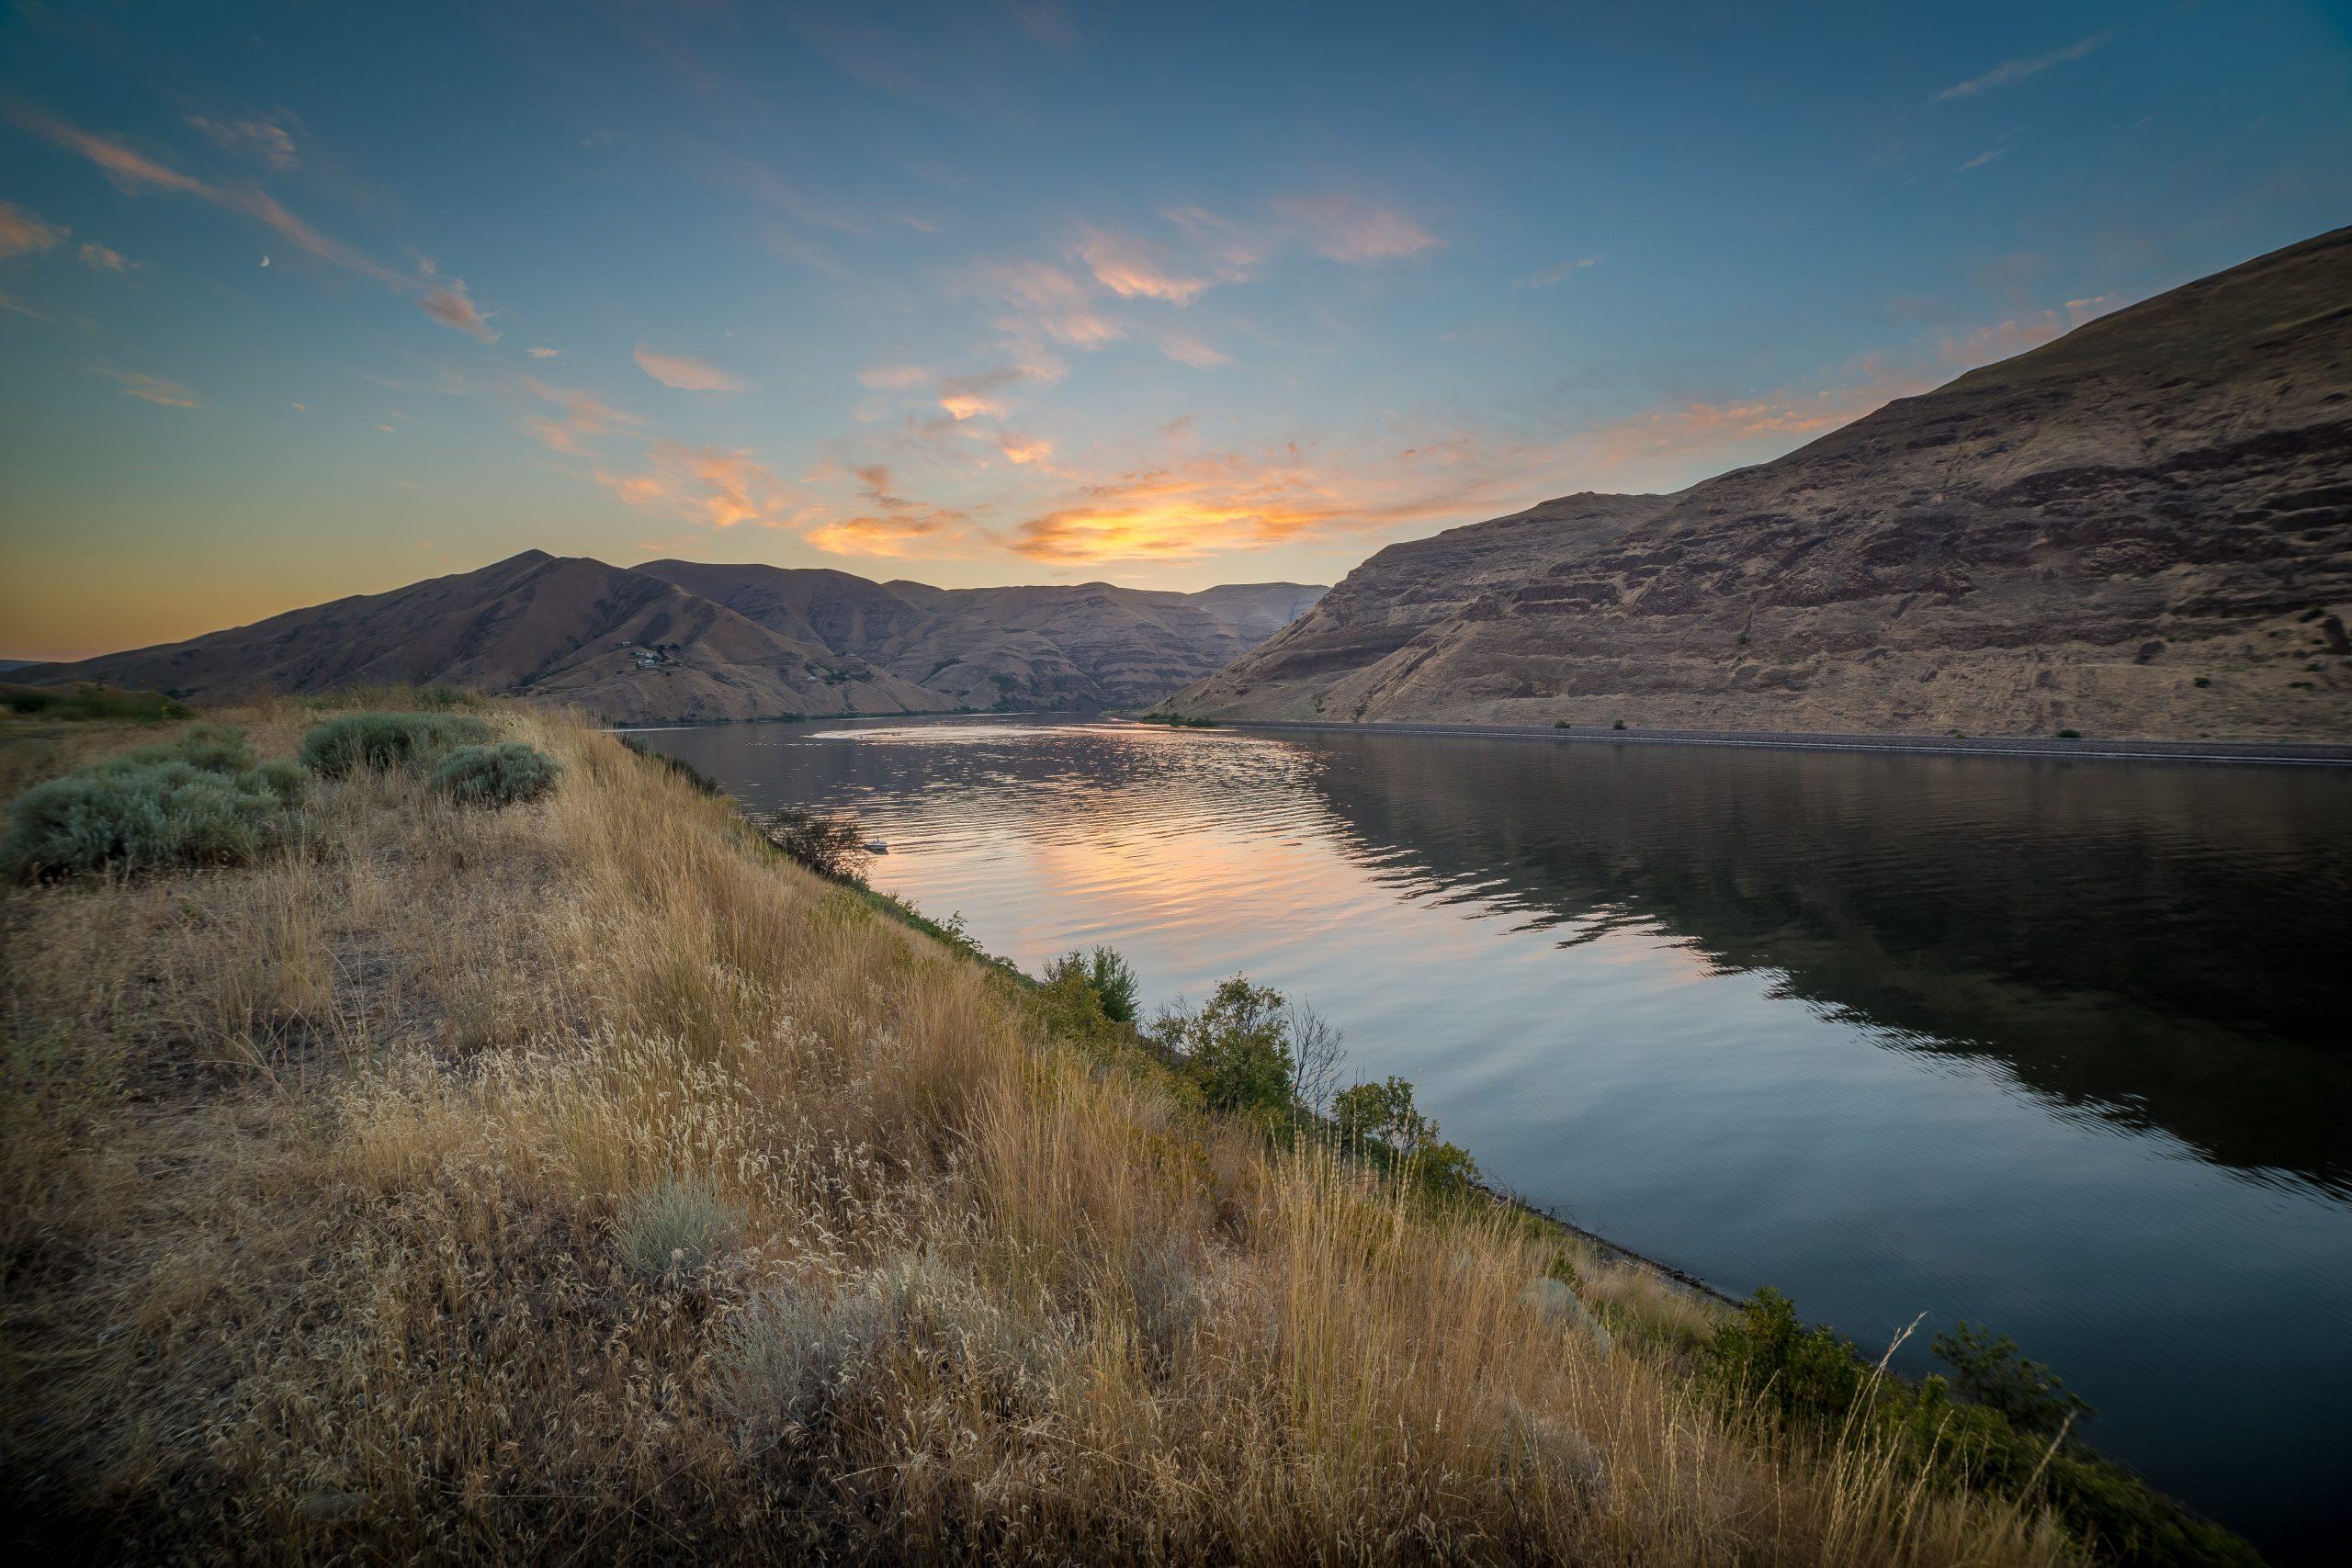 Beautiful Hells Canyon showing lake between mountains at dusk